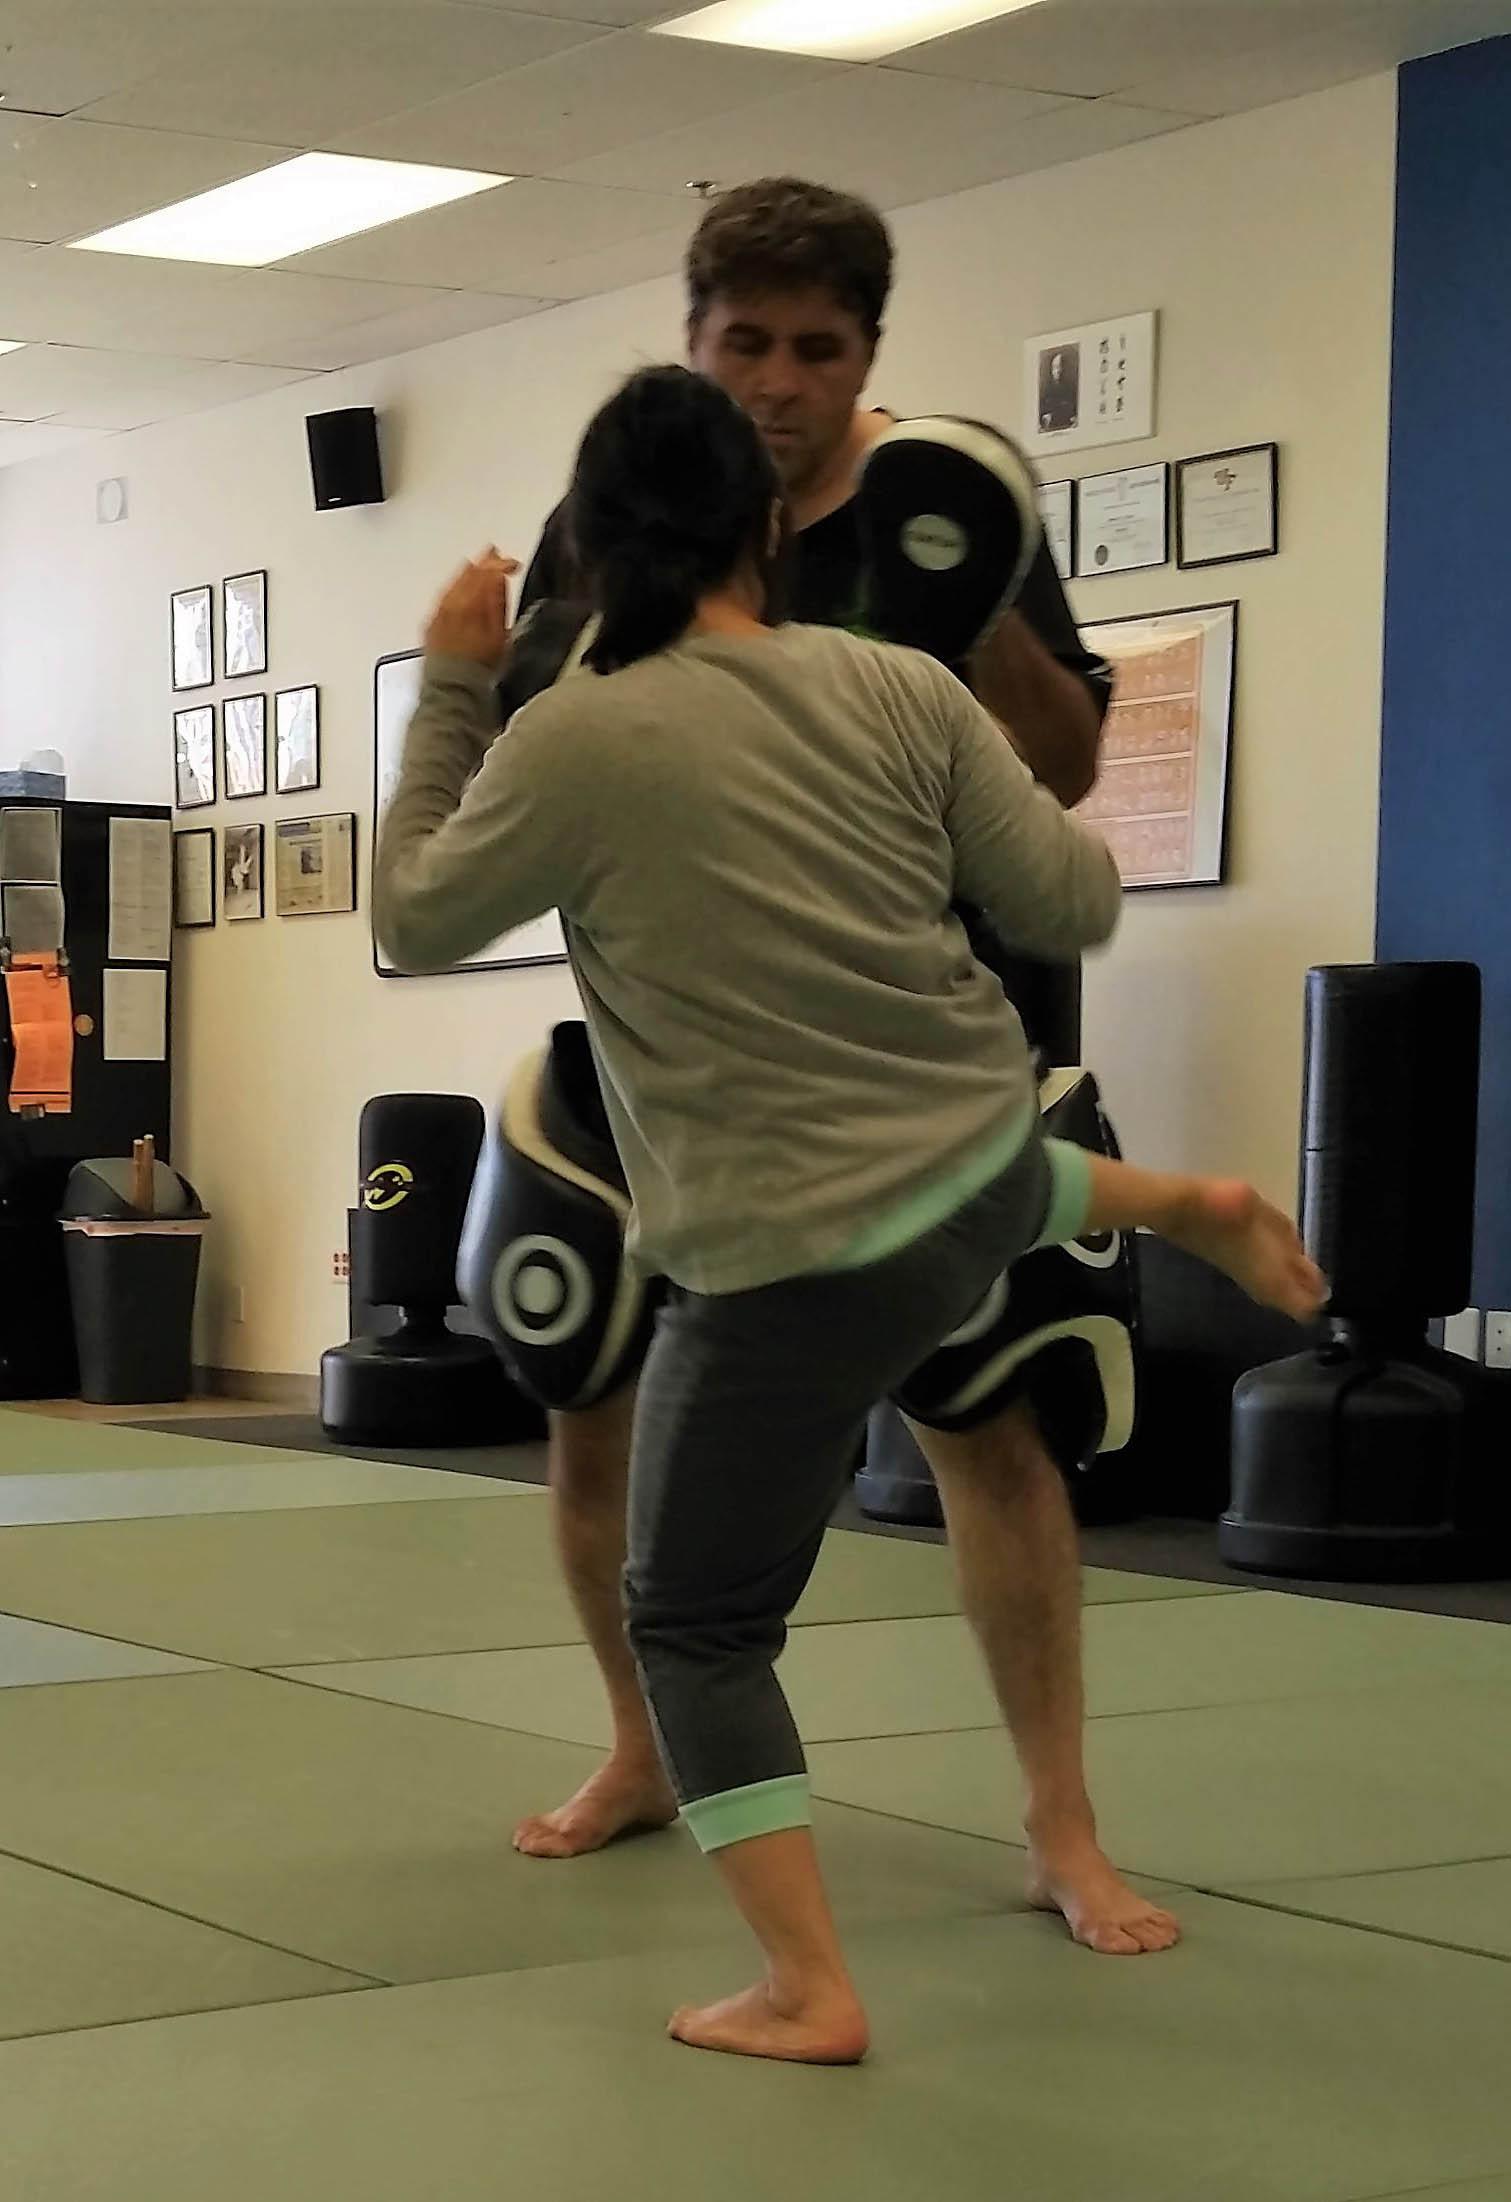 Httpsbrianvancise20180915bladed grappling jiu jitsu the kicking photo 2g fandeluxe Images